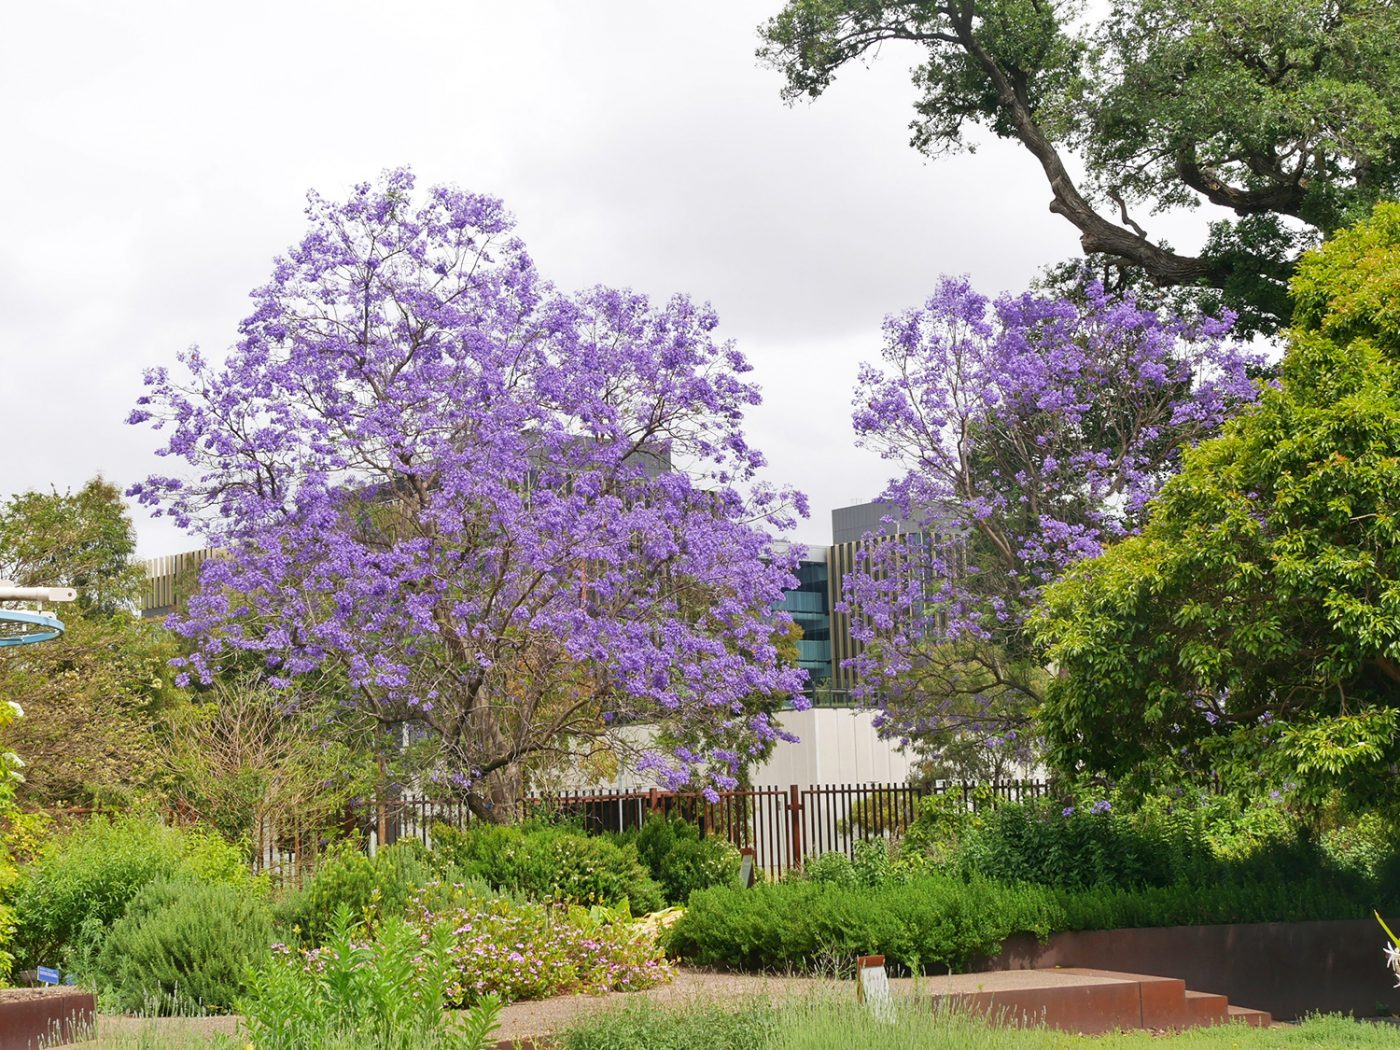 Blossom trees at the Botanical Gardens